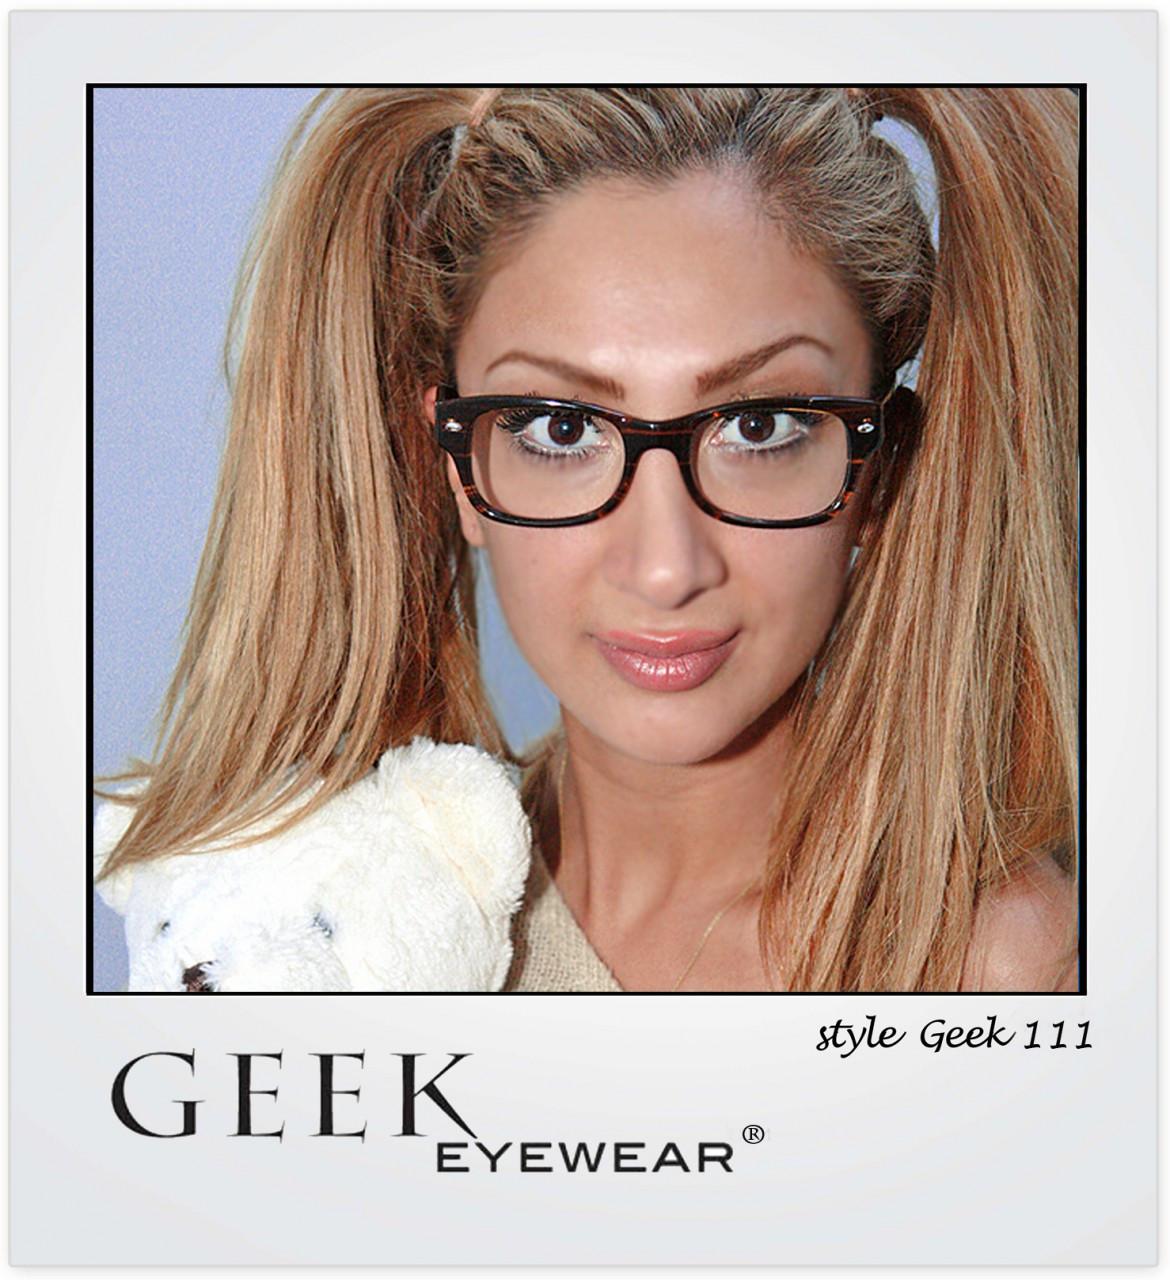 GEEK Eyewear GEEK 111